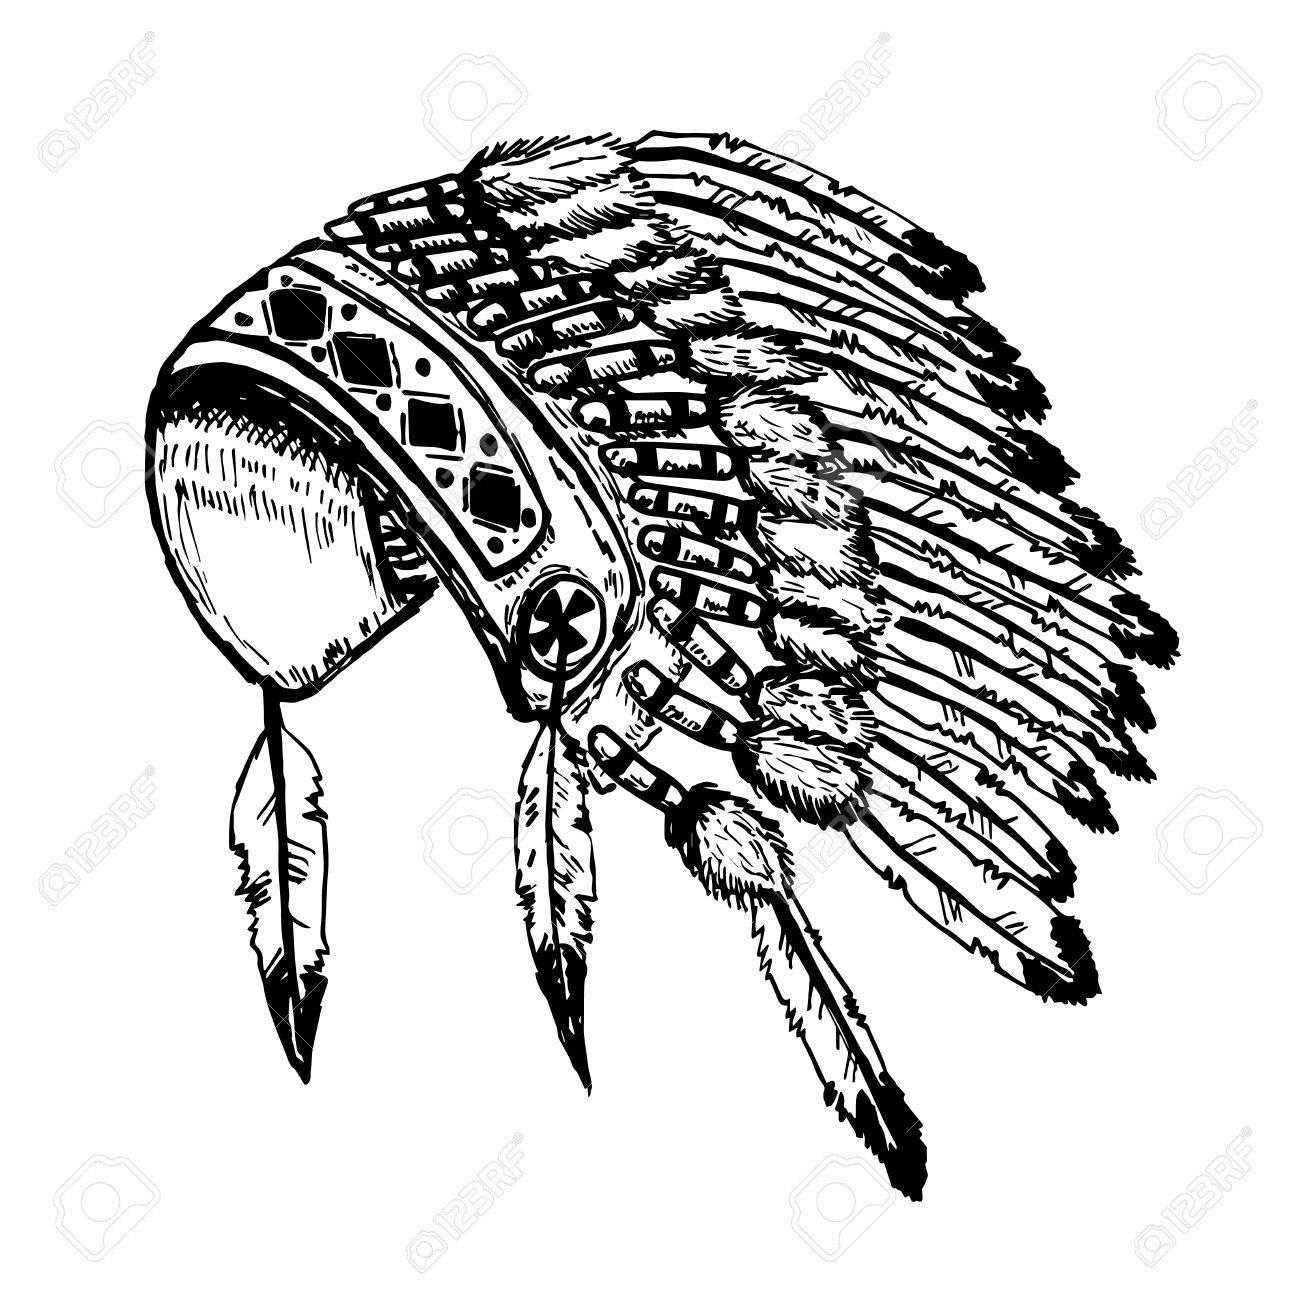 Native American Headdress Drawing At Getdrawings